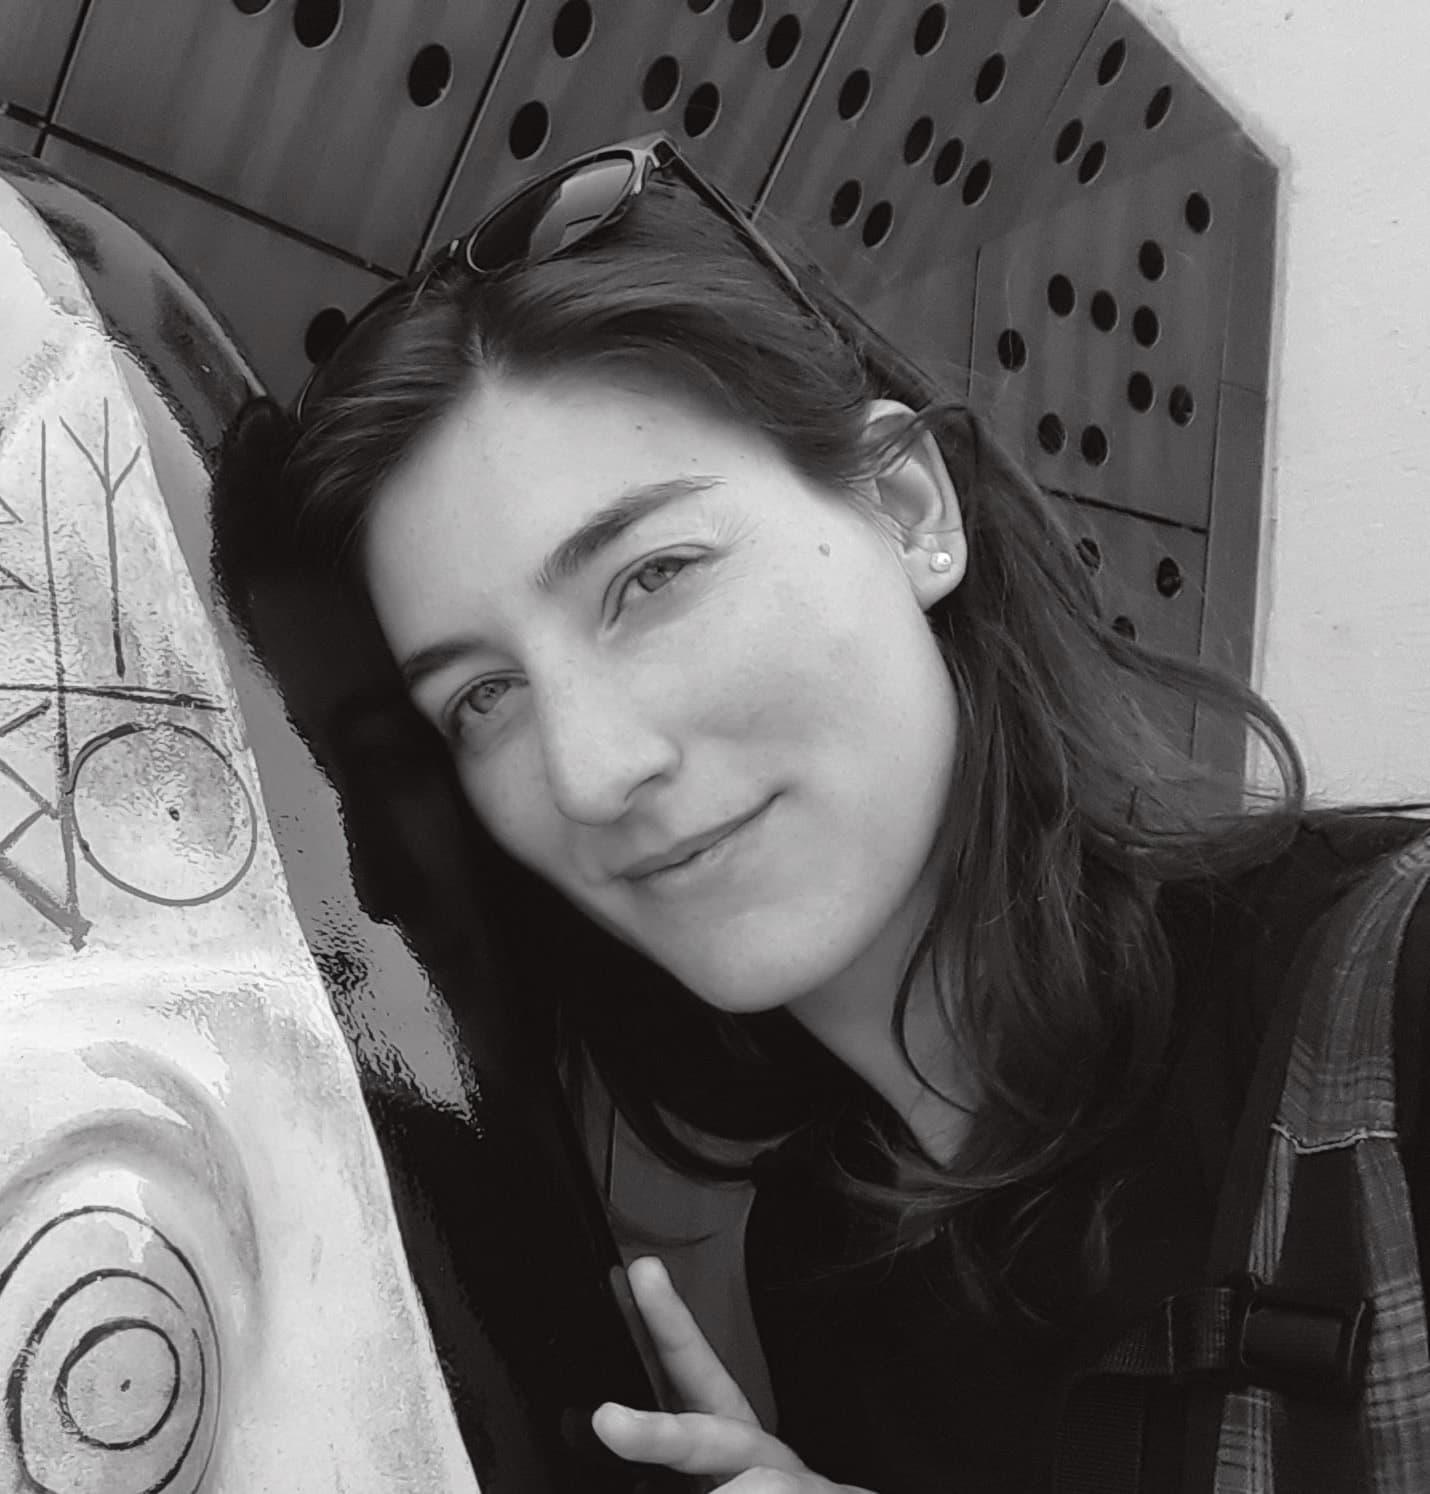 Julia Ecker